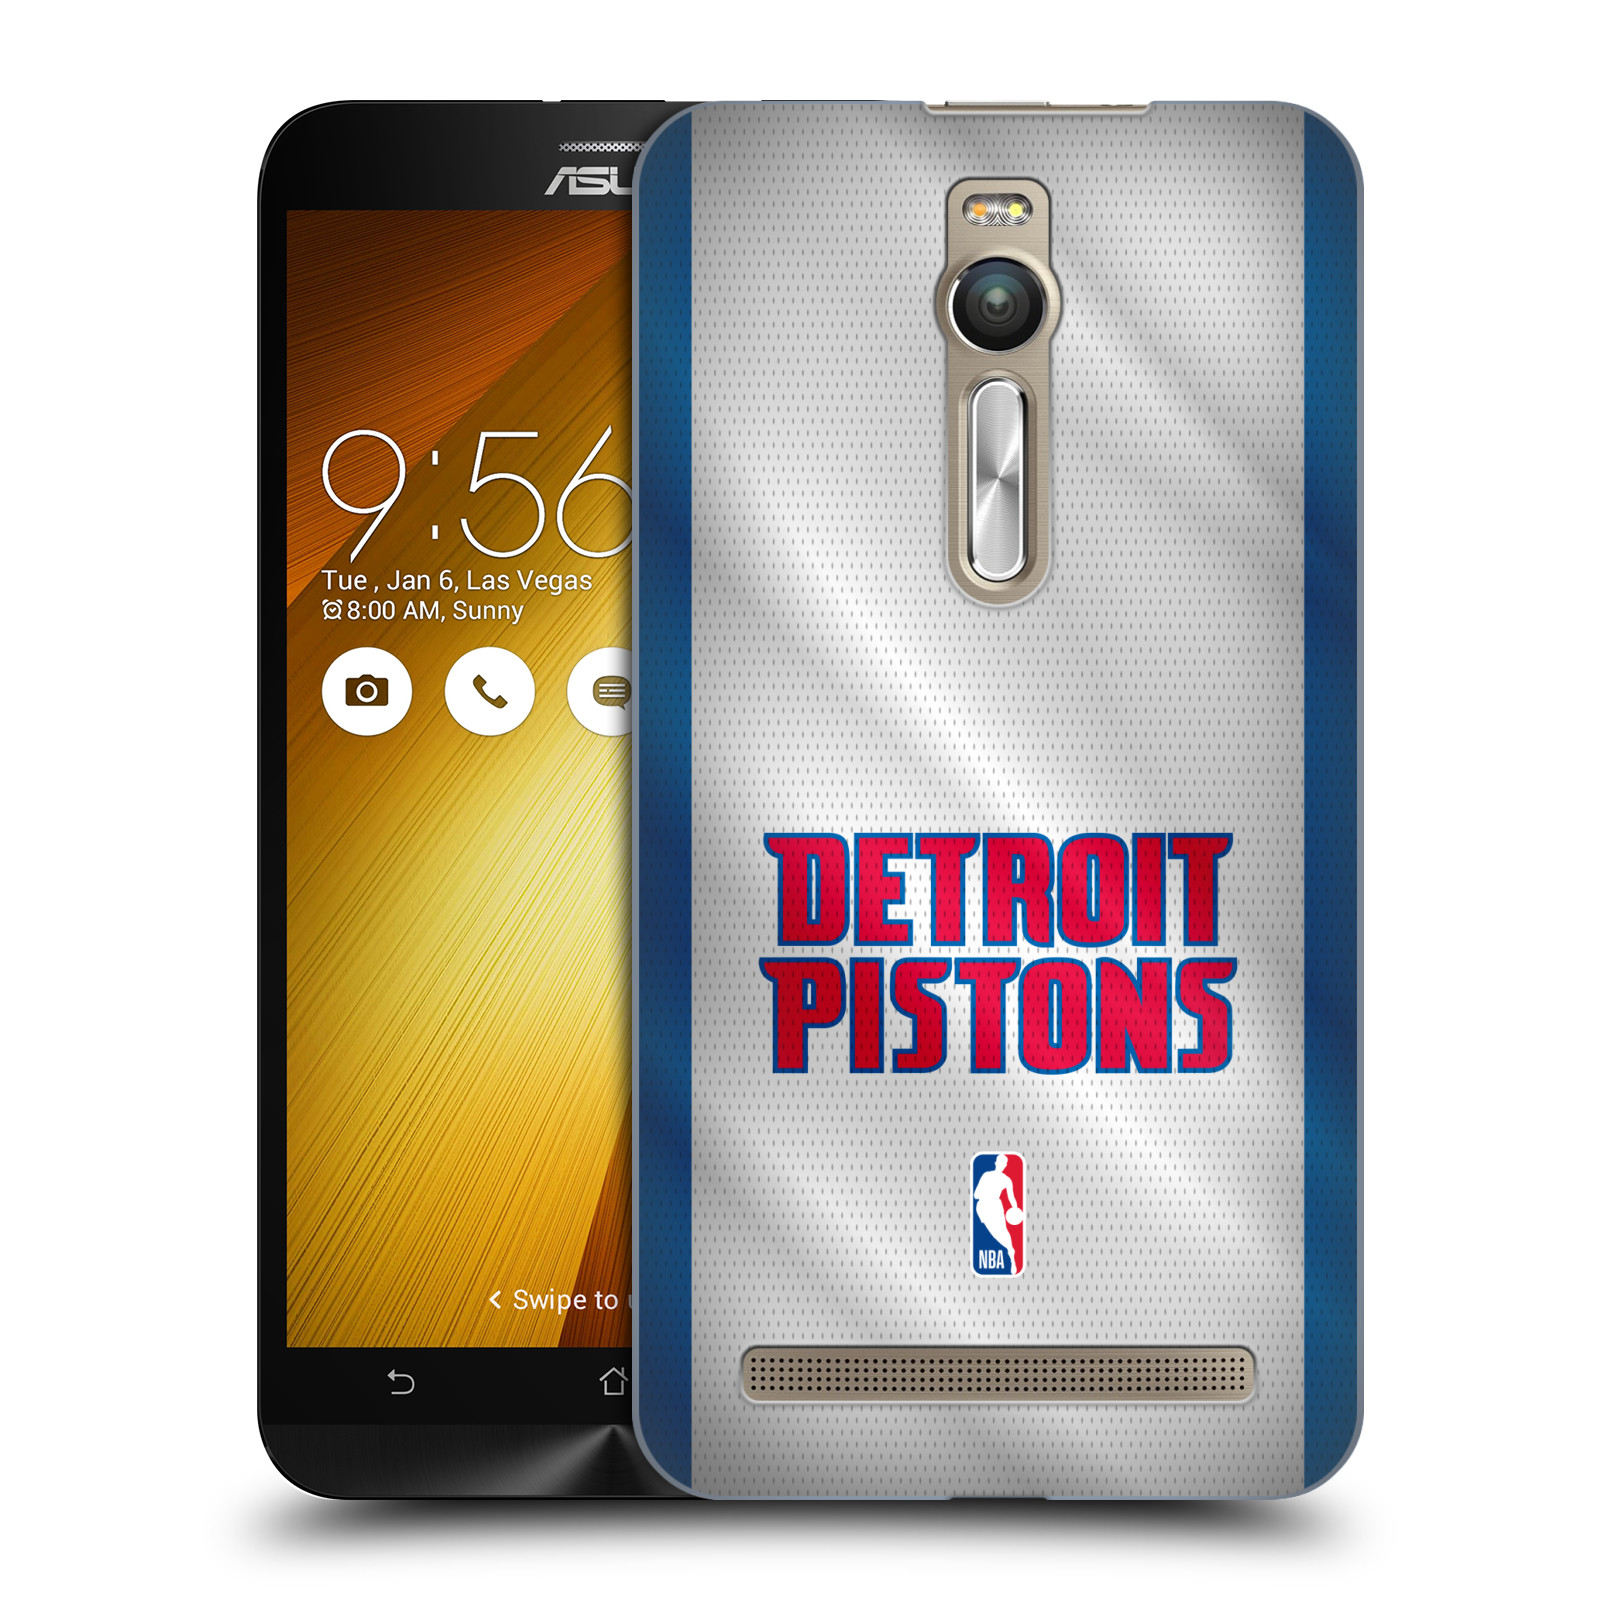 UFFICIALE-NBA-DETROIT-PISTONS-COVER-RETRO-RIGIDA-PER-ONEPLUS-ASUS-AMAZON